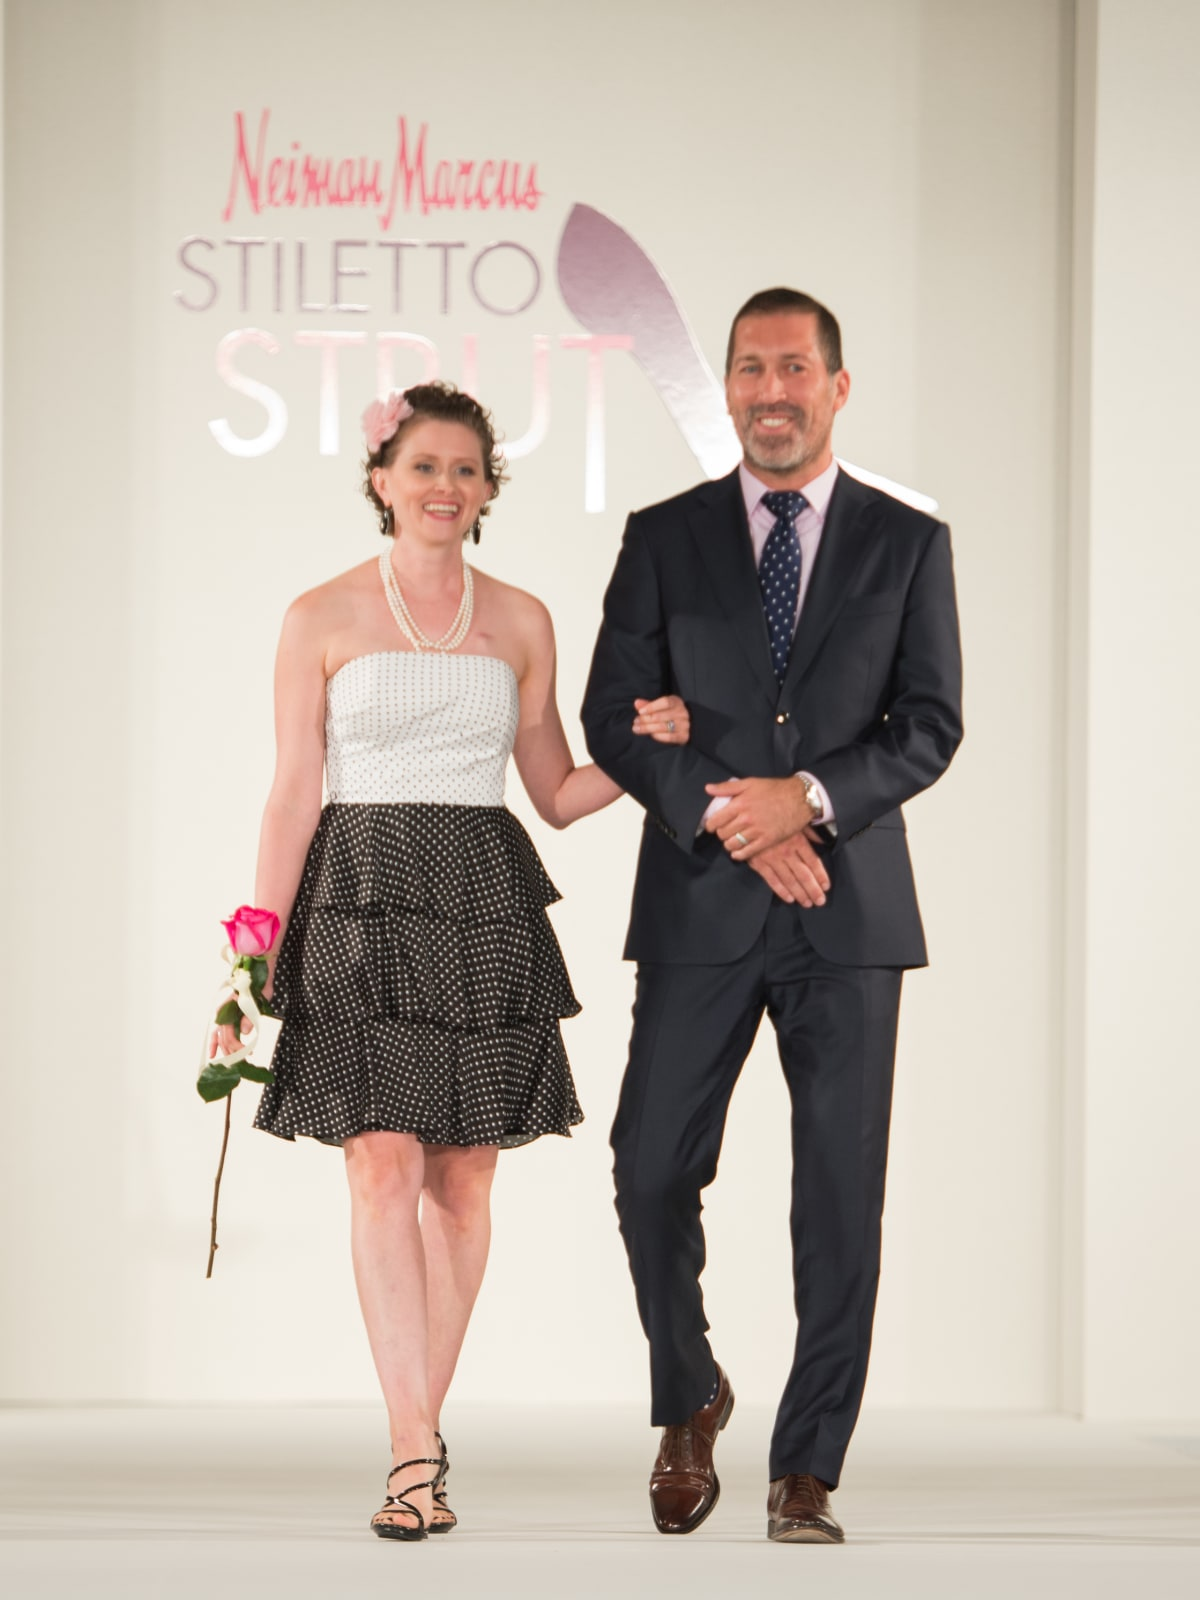 News, Shelby, Stiletto Strut, Sept. 2015 Heather Lozado and Hernan Vargas